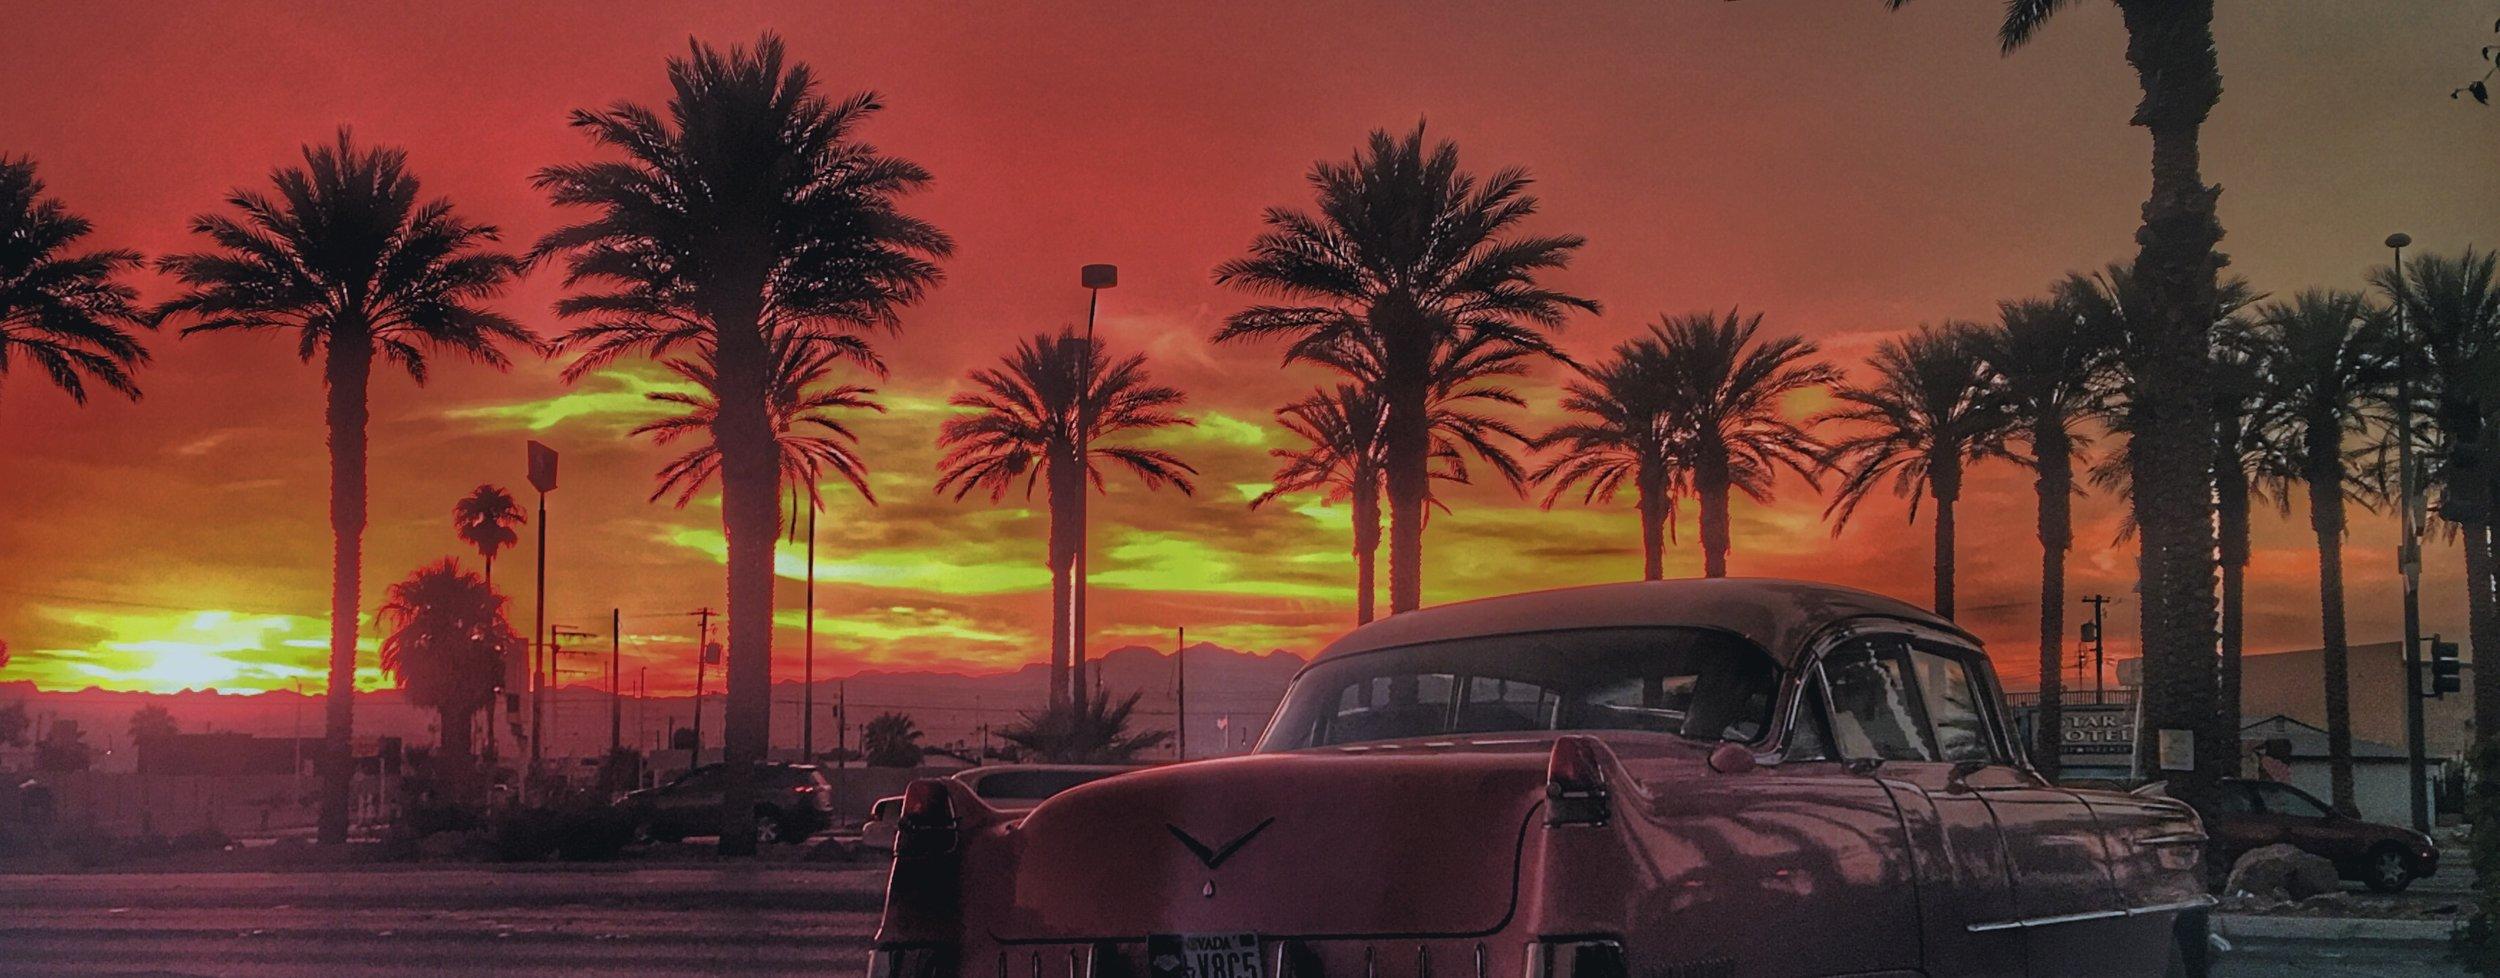 sunsetcaddy.JPG